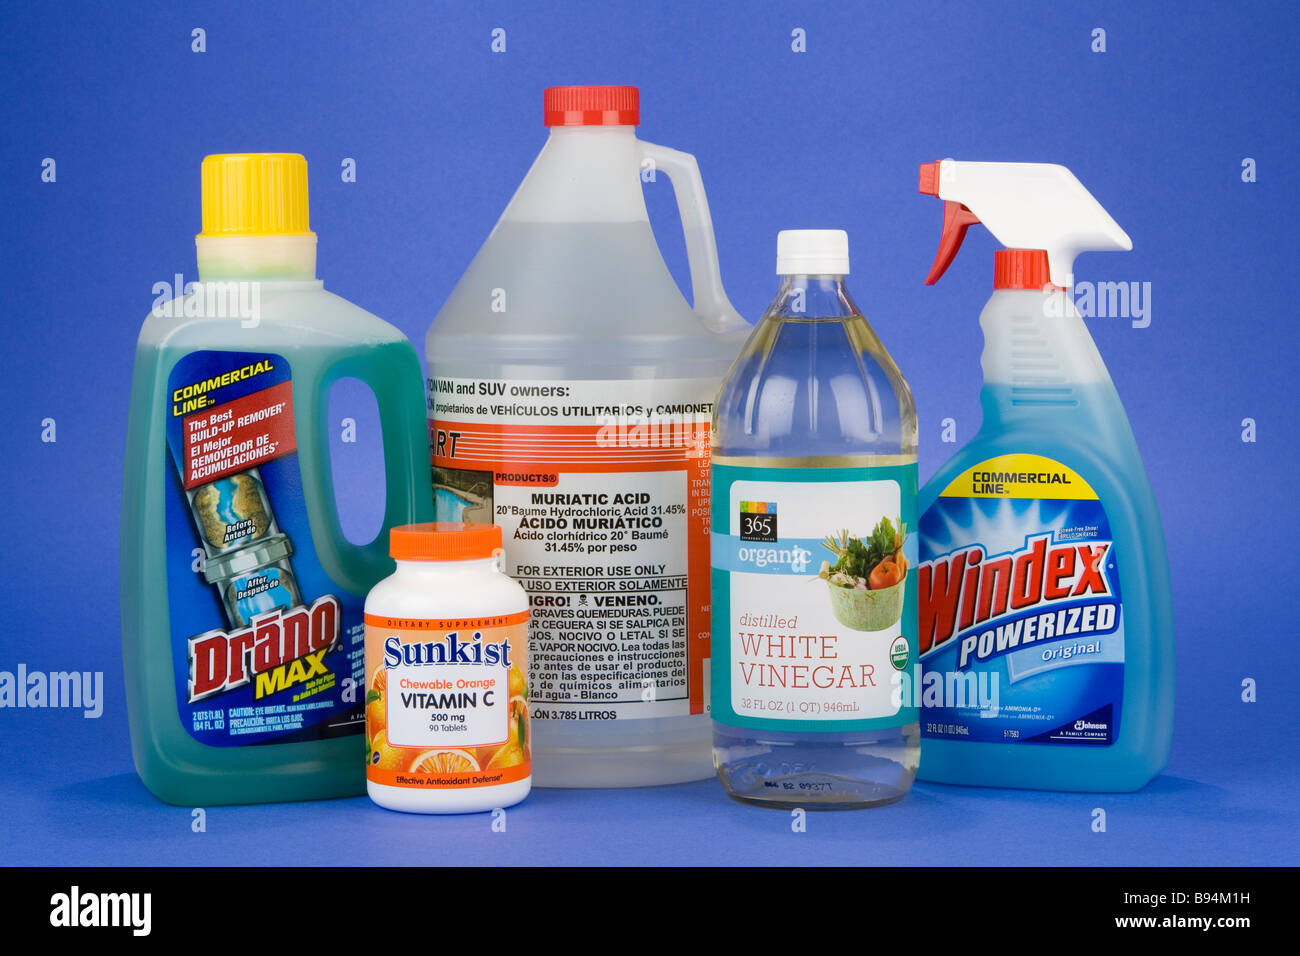 common household acids and bases drano vitamin c muriatic acid